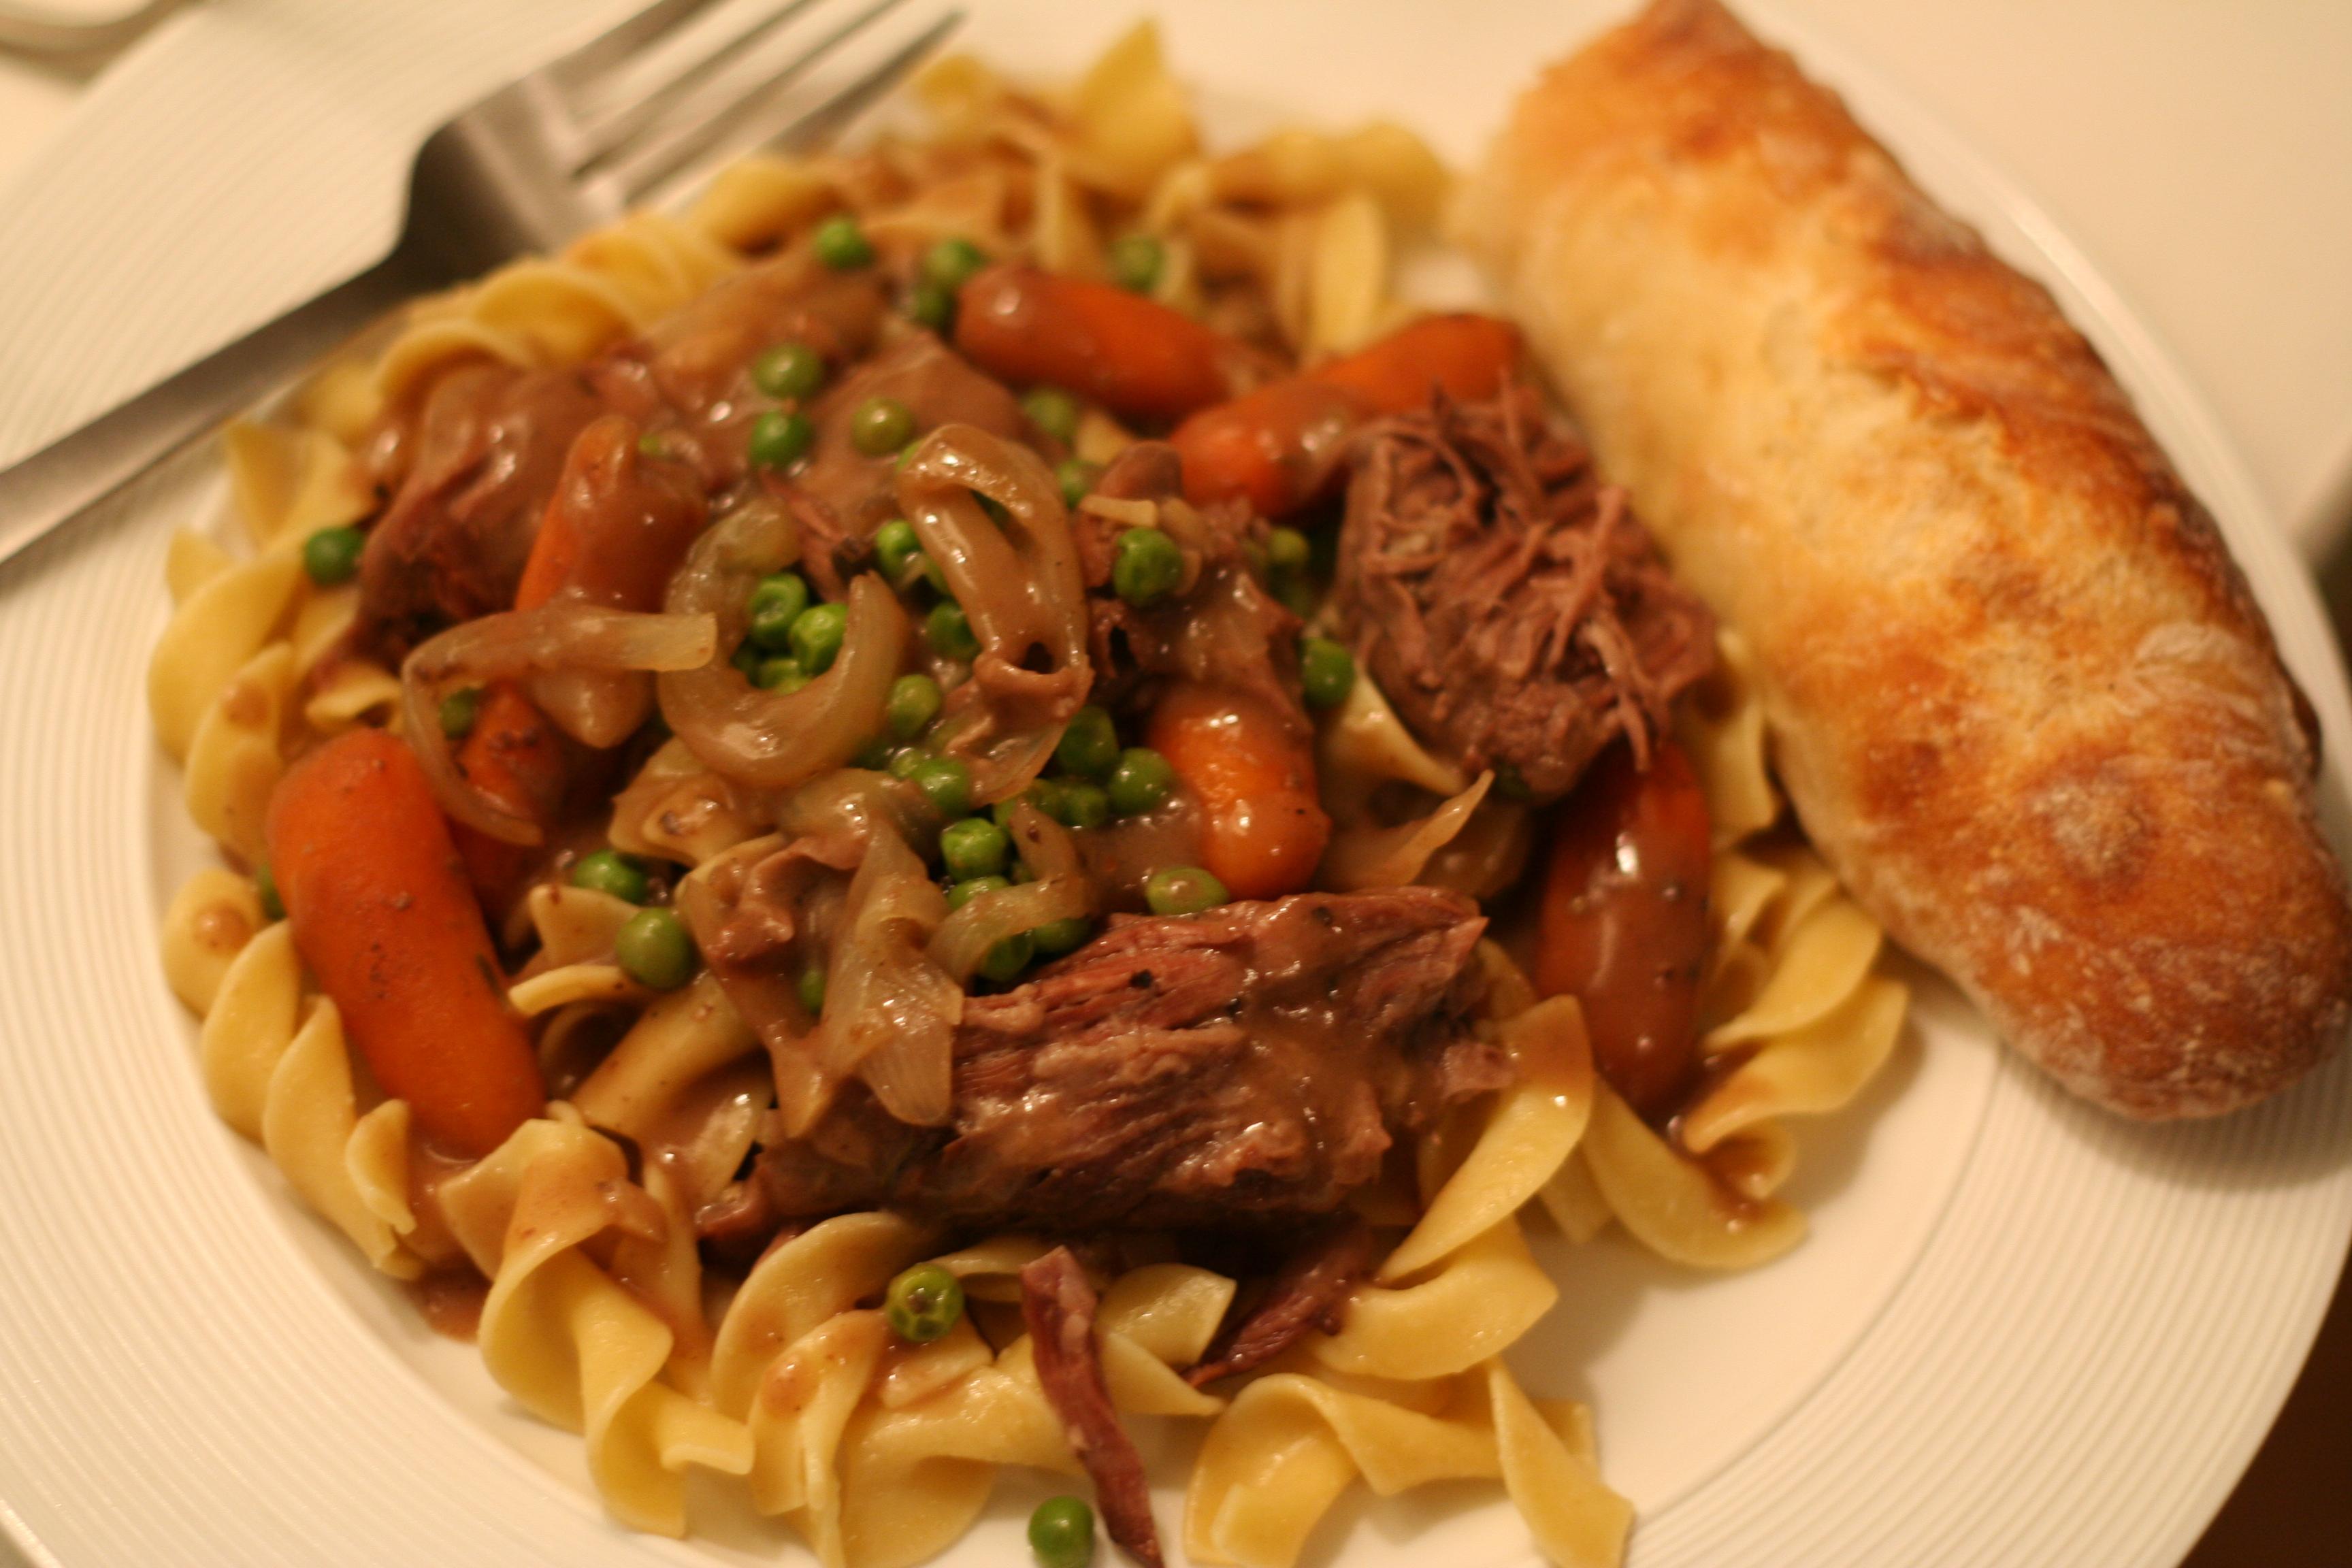 pot roast over egg noodles with gravy